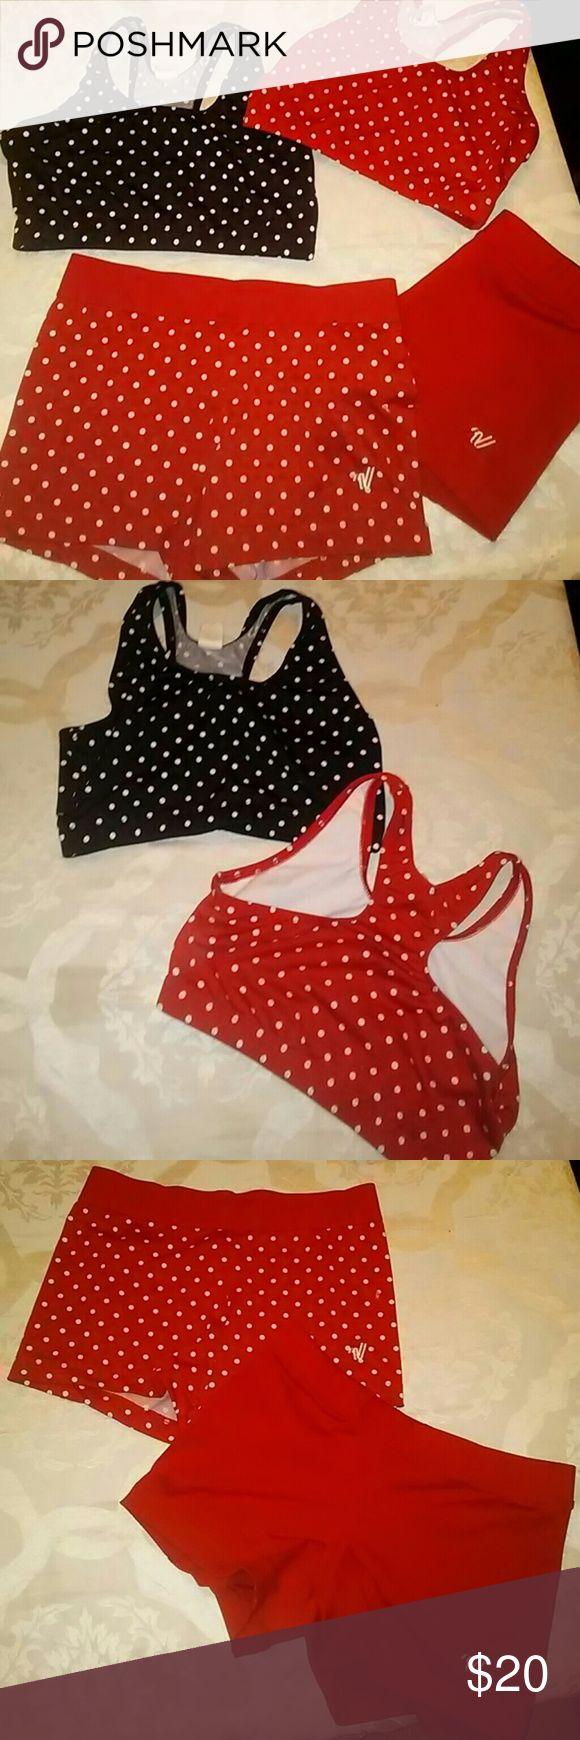 Workout attire 2 sports bras red and black polka dot and spandex bottoms all size medium Varsity brand varsity Other